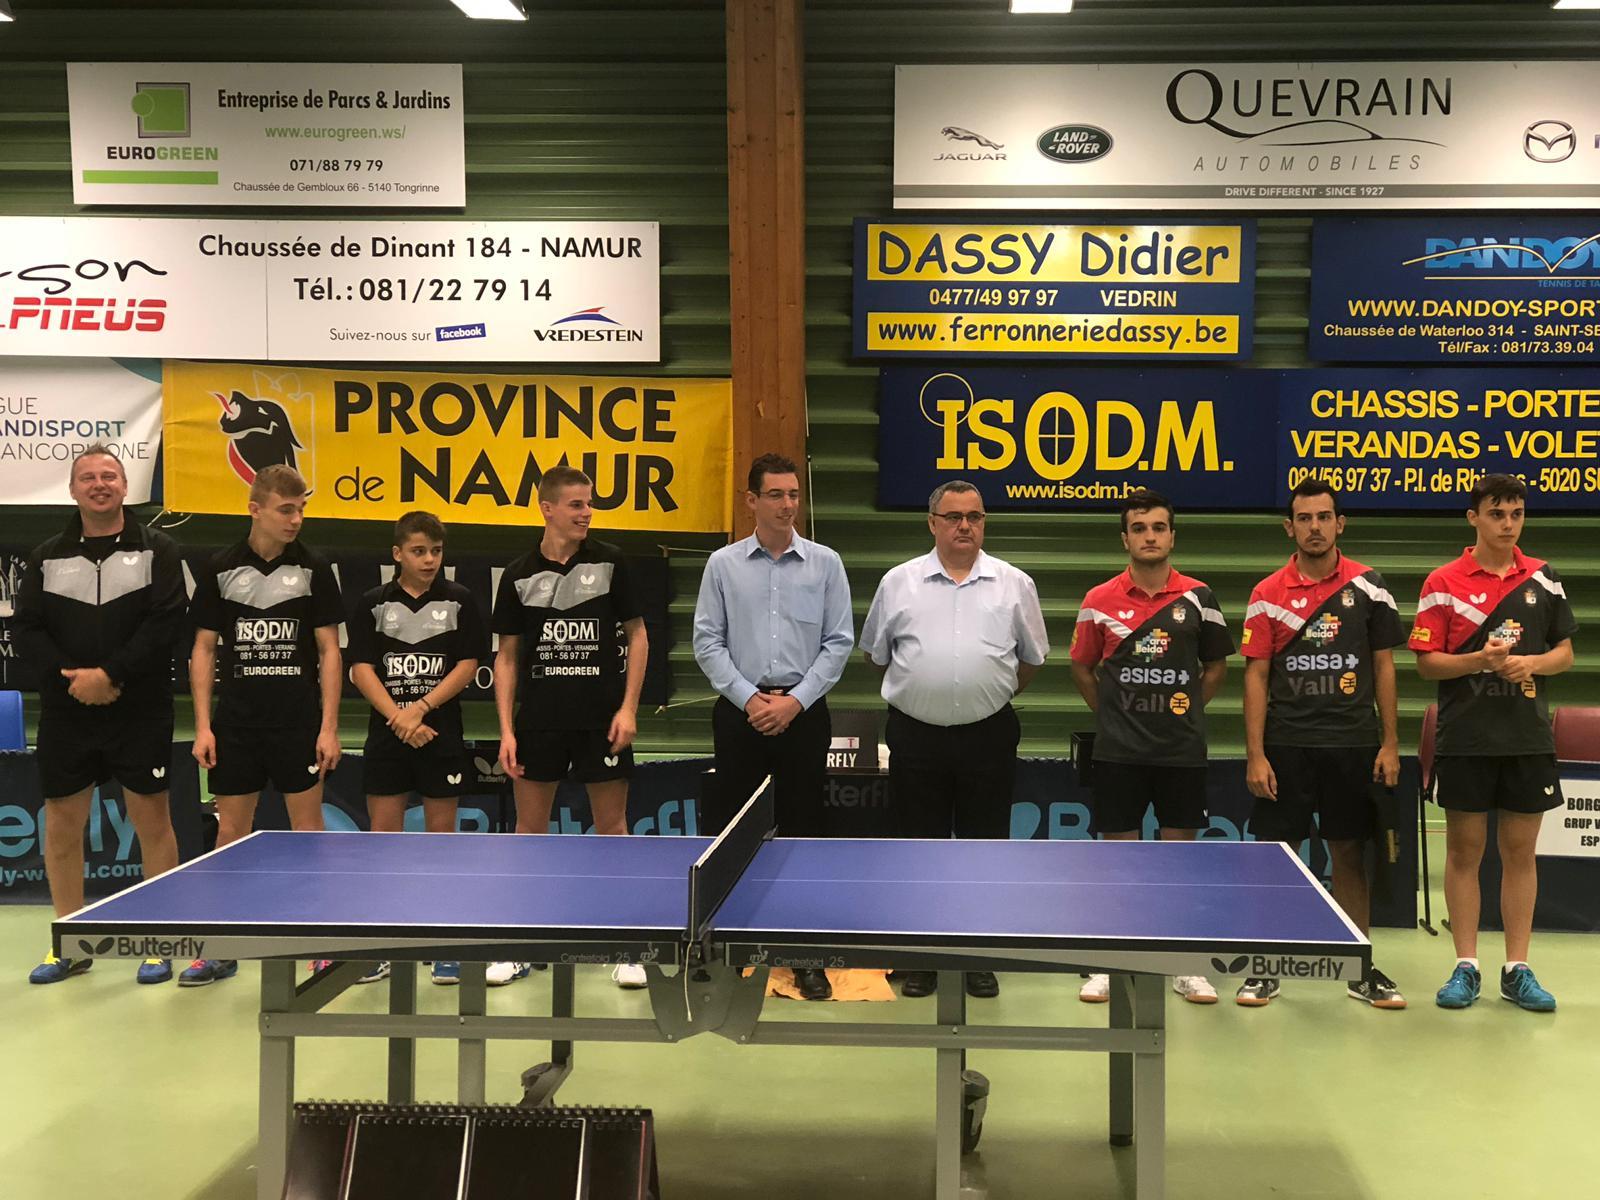 L'ASISA Borges Vall es classifica 1er de grup a l'Europe Cup